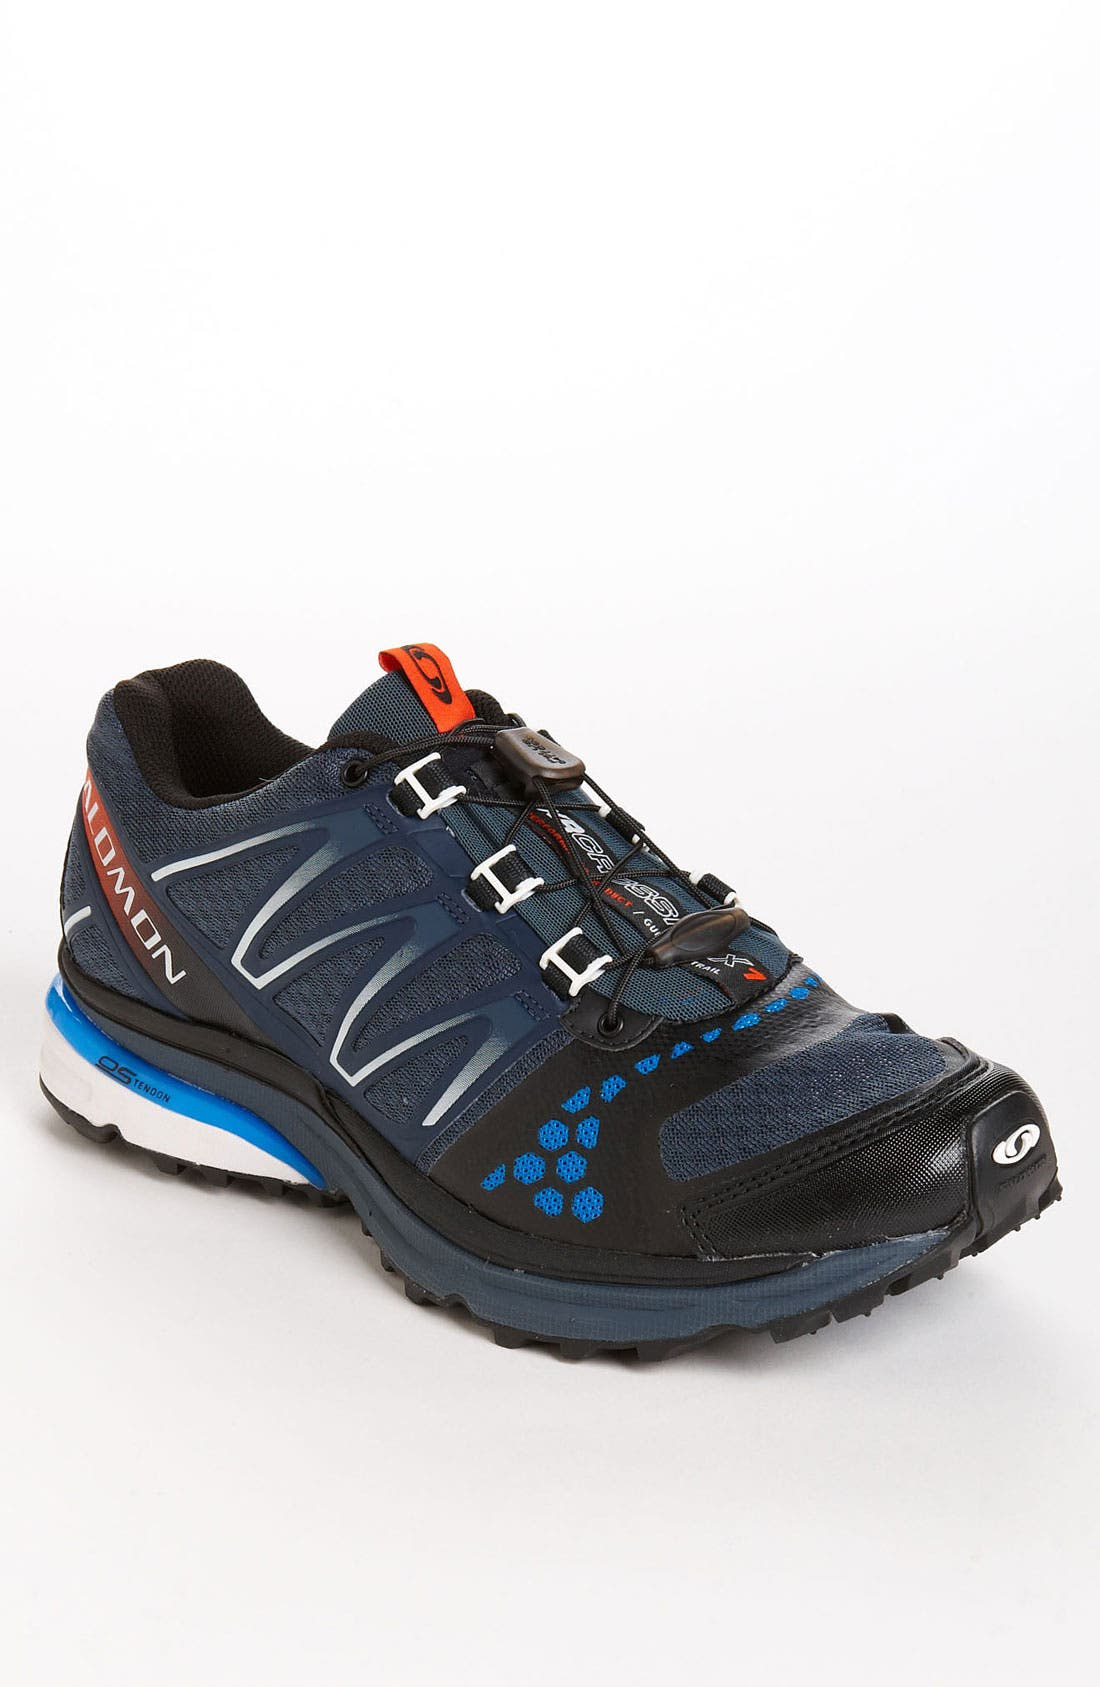 Main Image - Salomon 'XR Crossmax Guidance' Trail Running Shoe (Men)